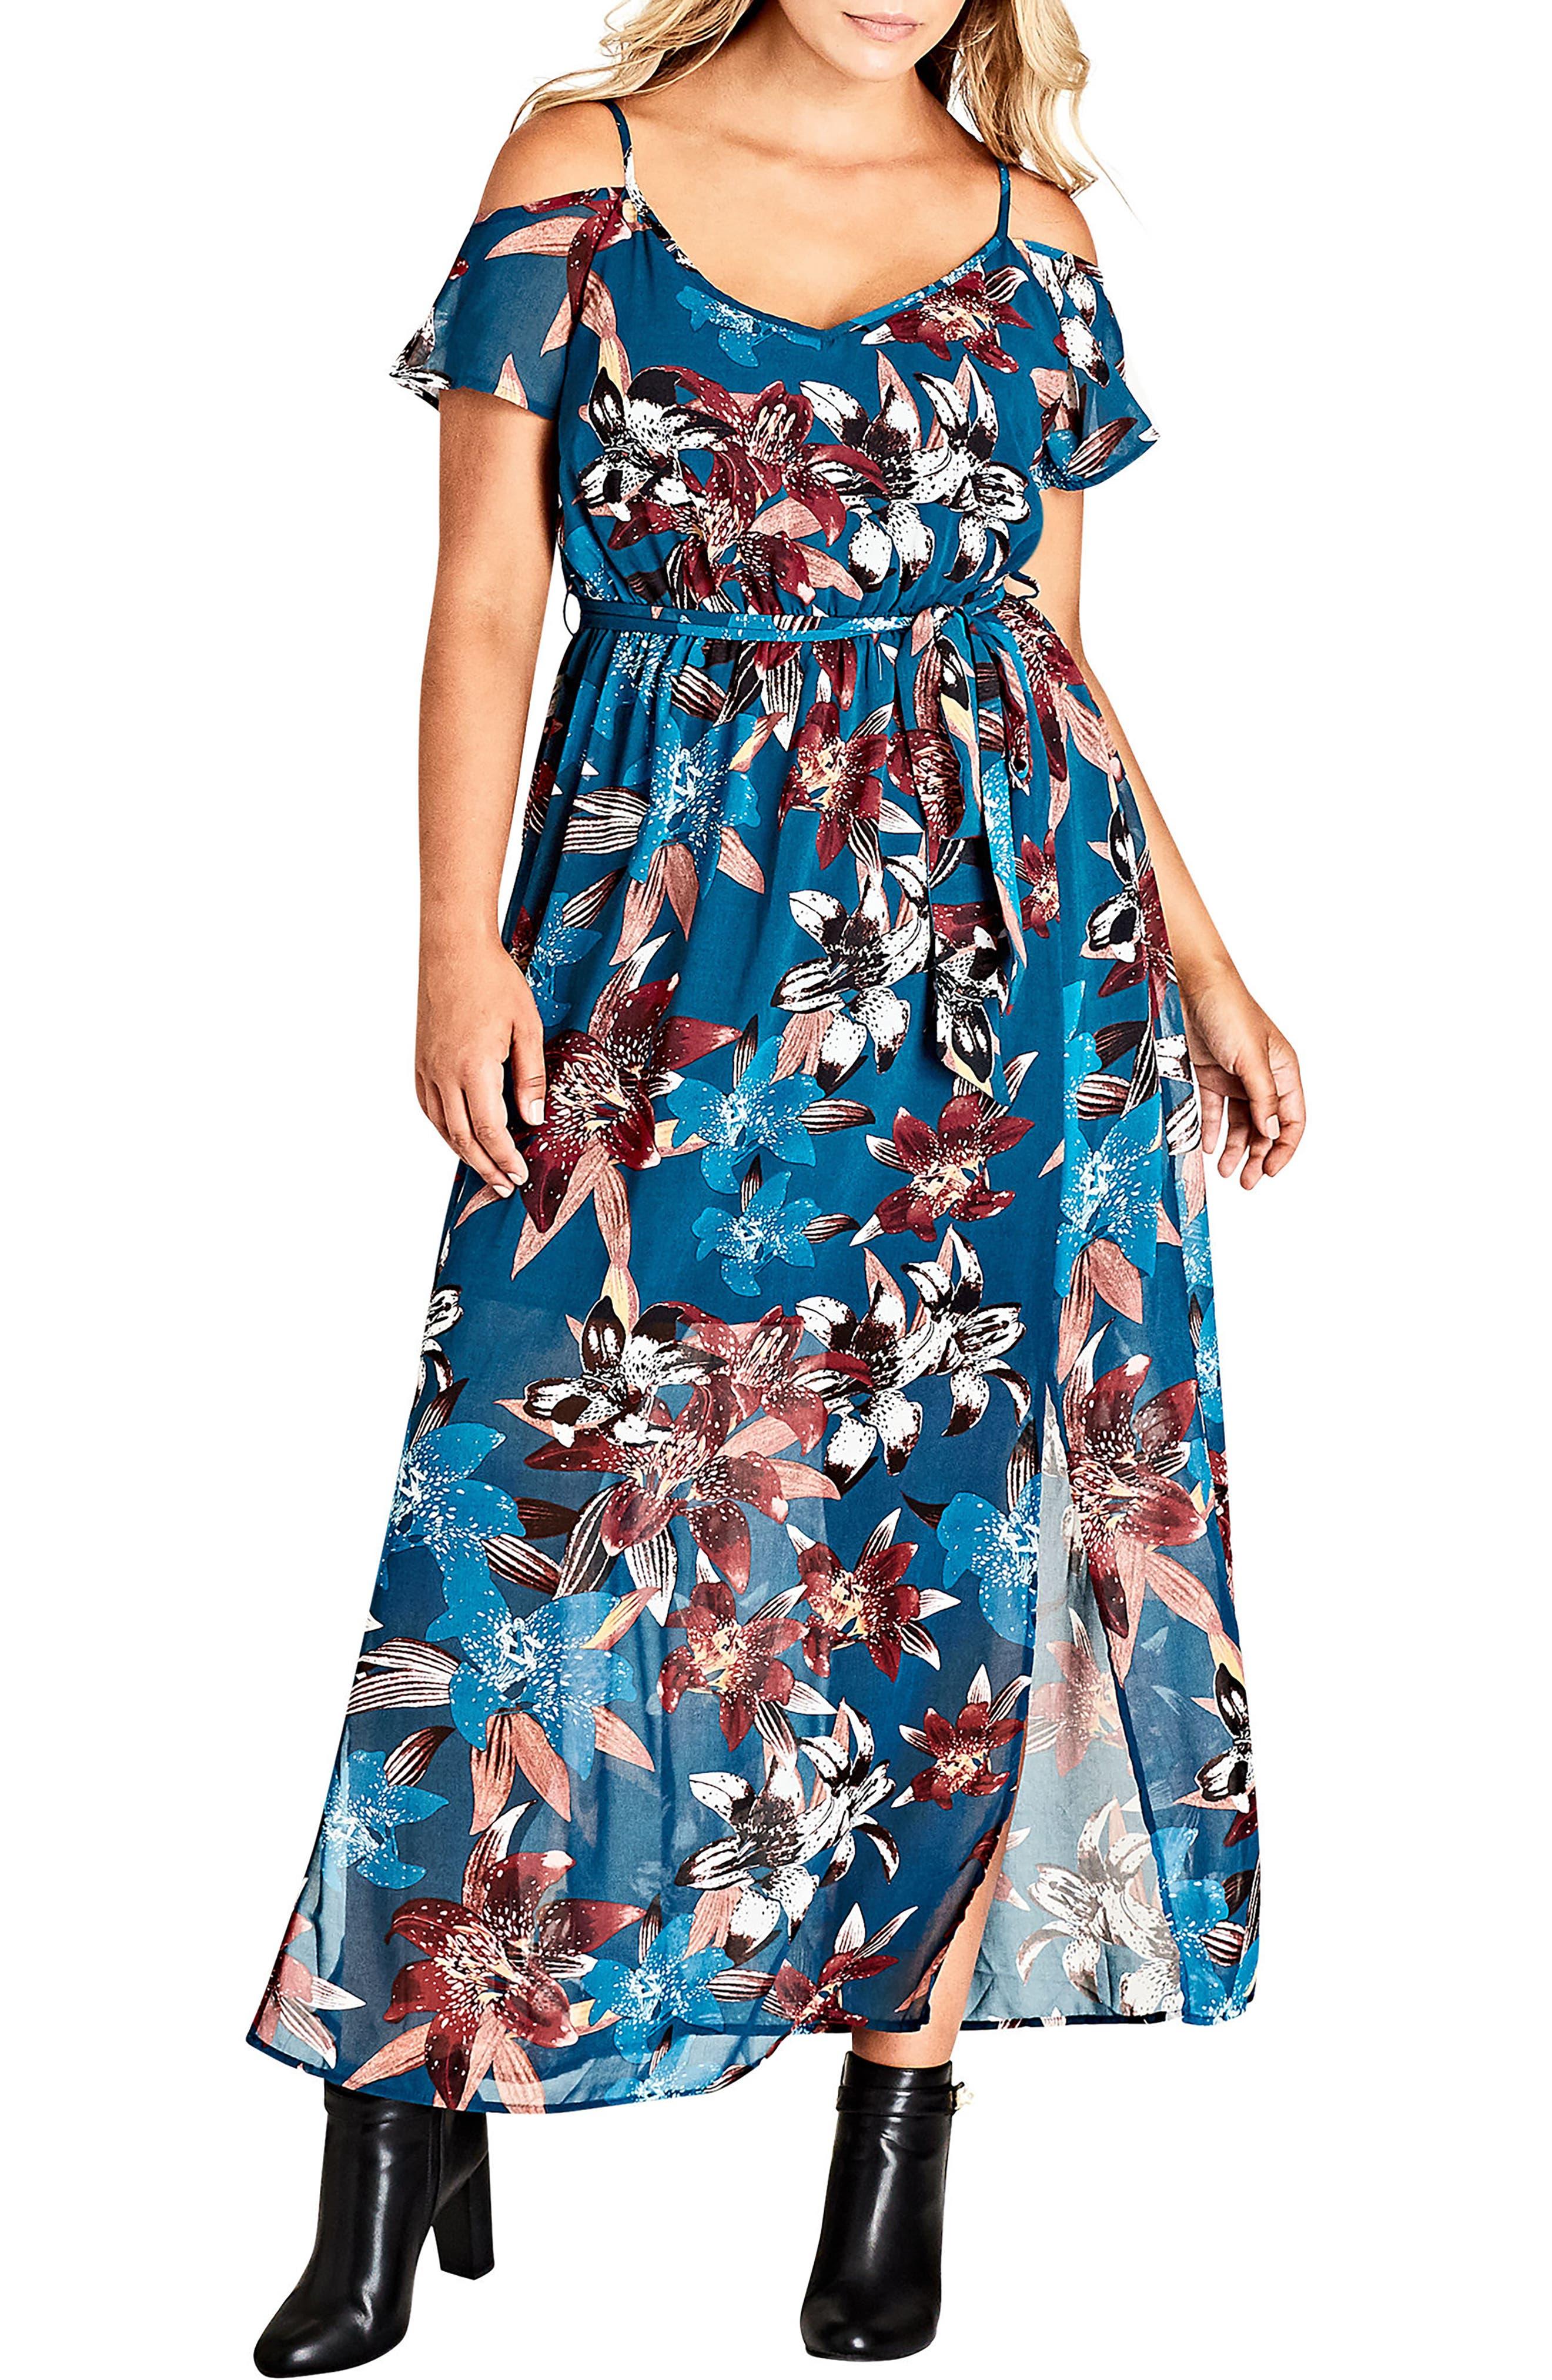 Fall Lily Off the Shoulder Maxi Dress,                         Main,                         color, 001